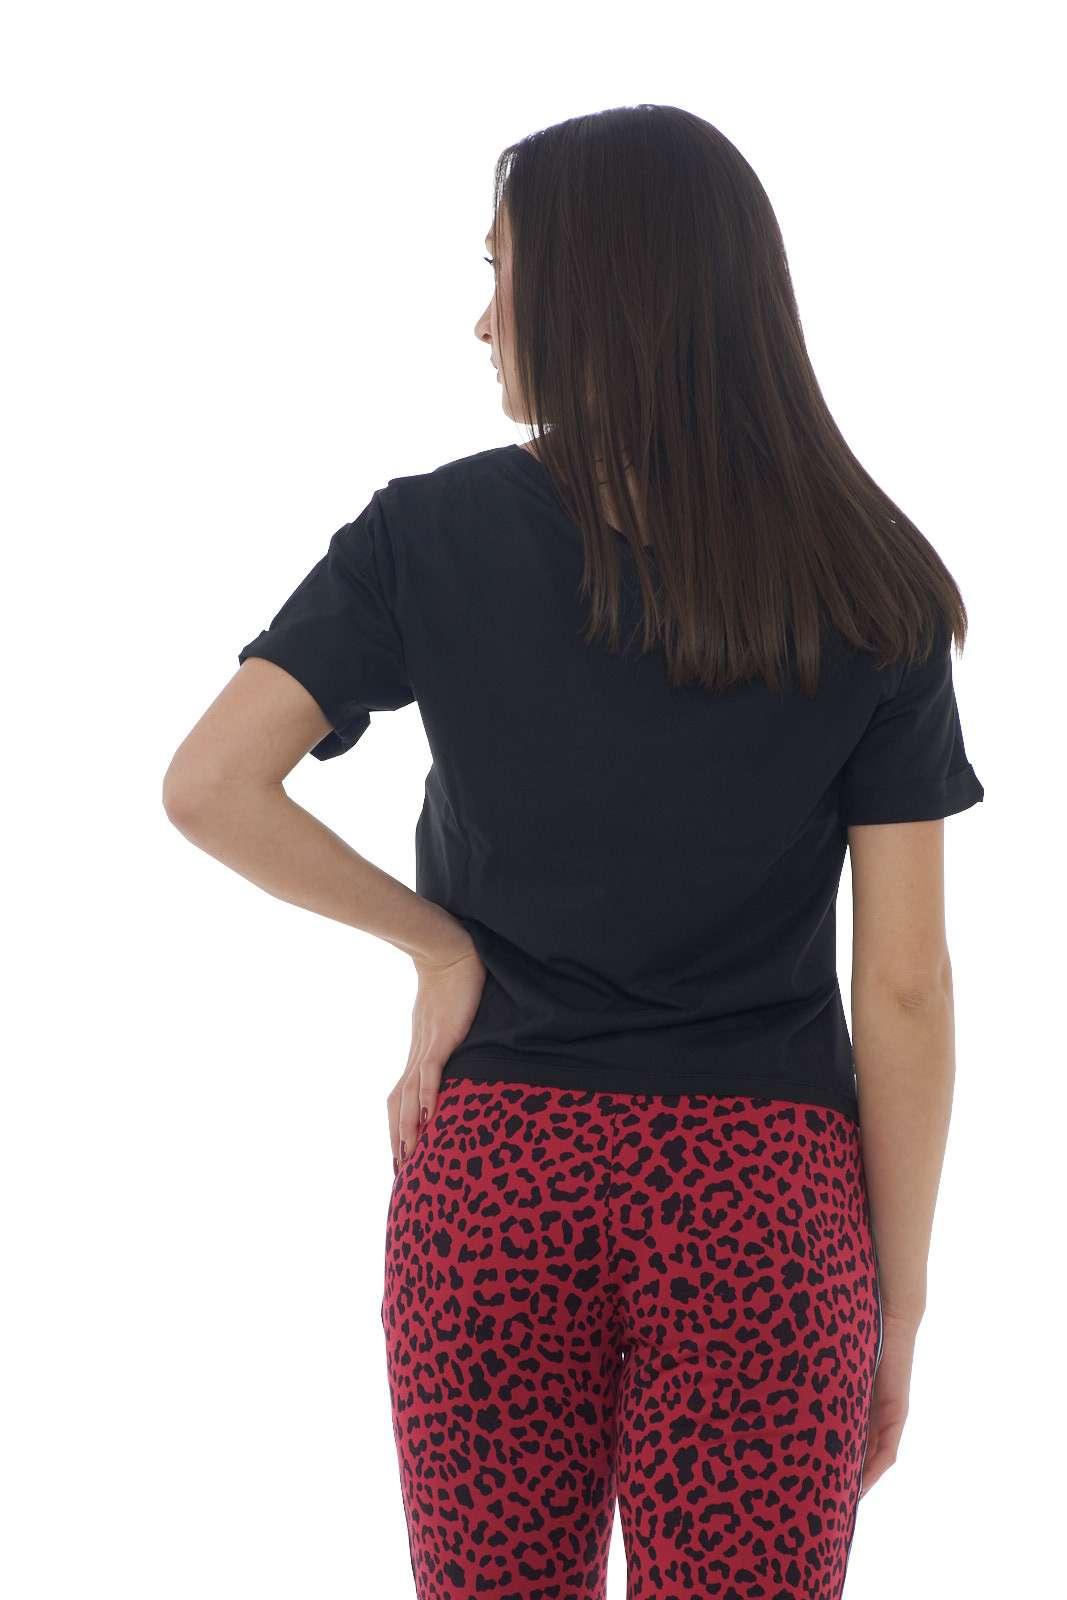 https://www.parmax.com/media/catalog/product/a/i/PE-outlet_parmax-t-shirt-donna-Colmar-8617T-C_1.jpg